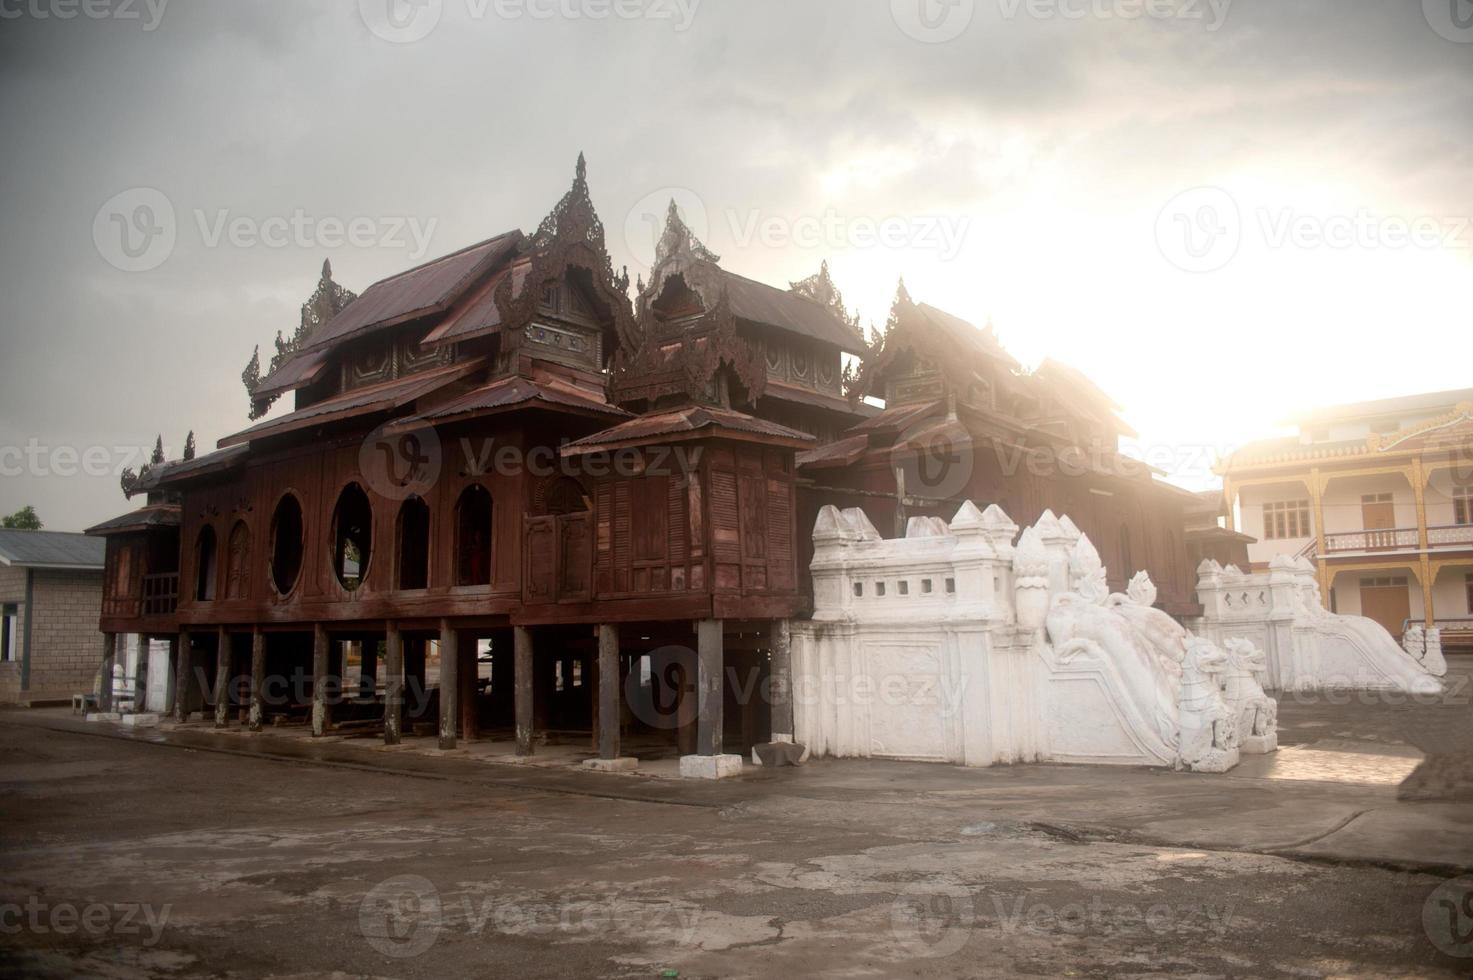 Holzkirche von Nyan Shwe kgua Tempel in Myanmar. foto